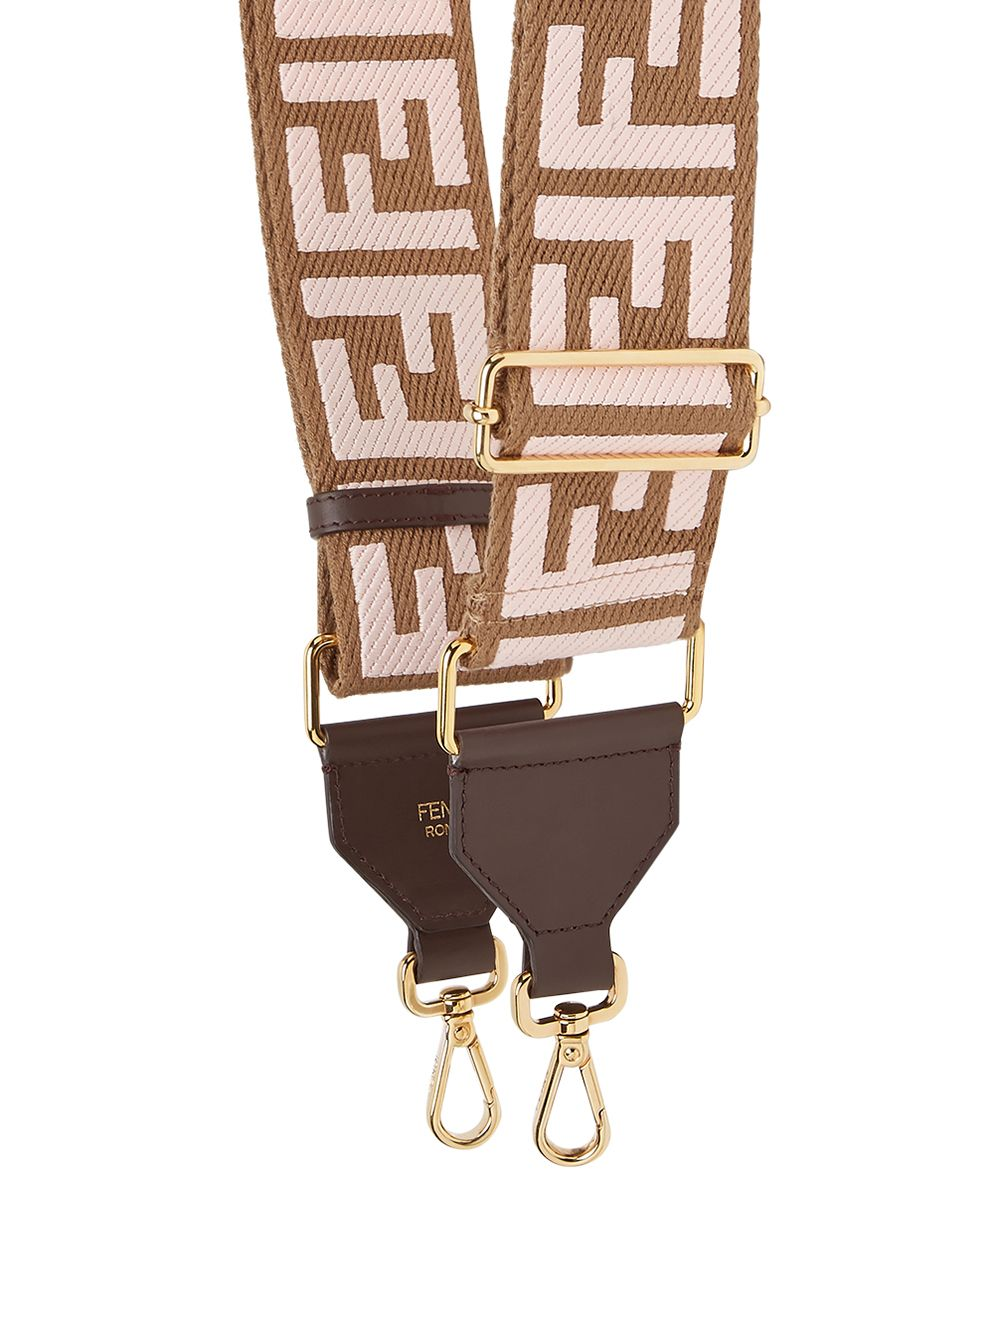 FENDI | Fendi ремень для сумки с логотипом | Clouty